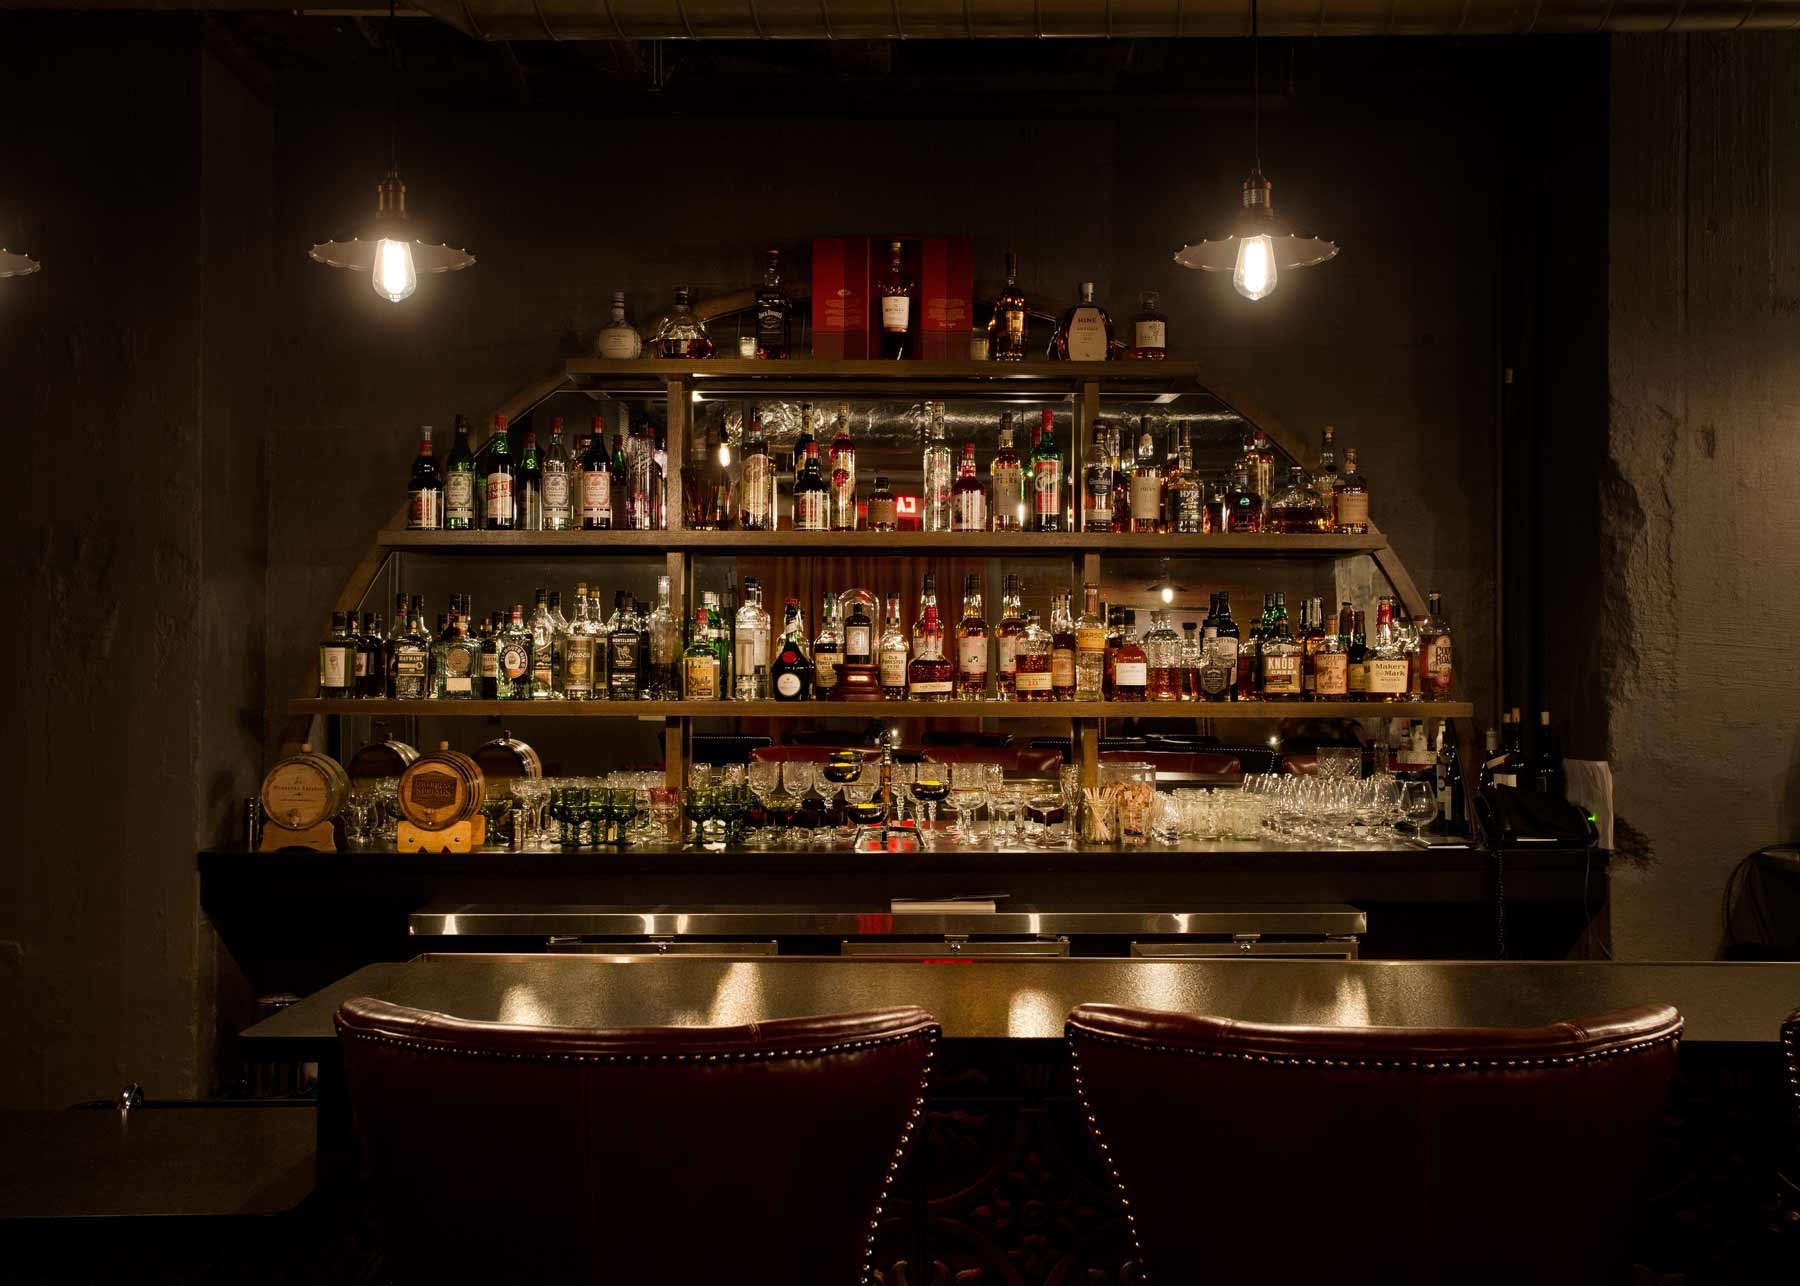 Bar seating and bottles at Dockum speakeasy bar in Wichita